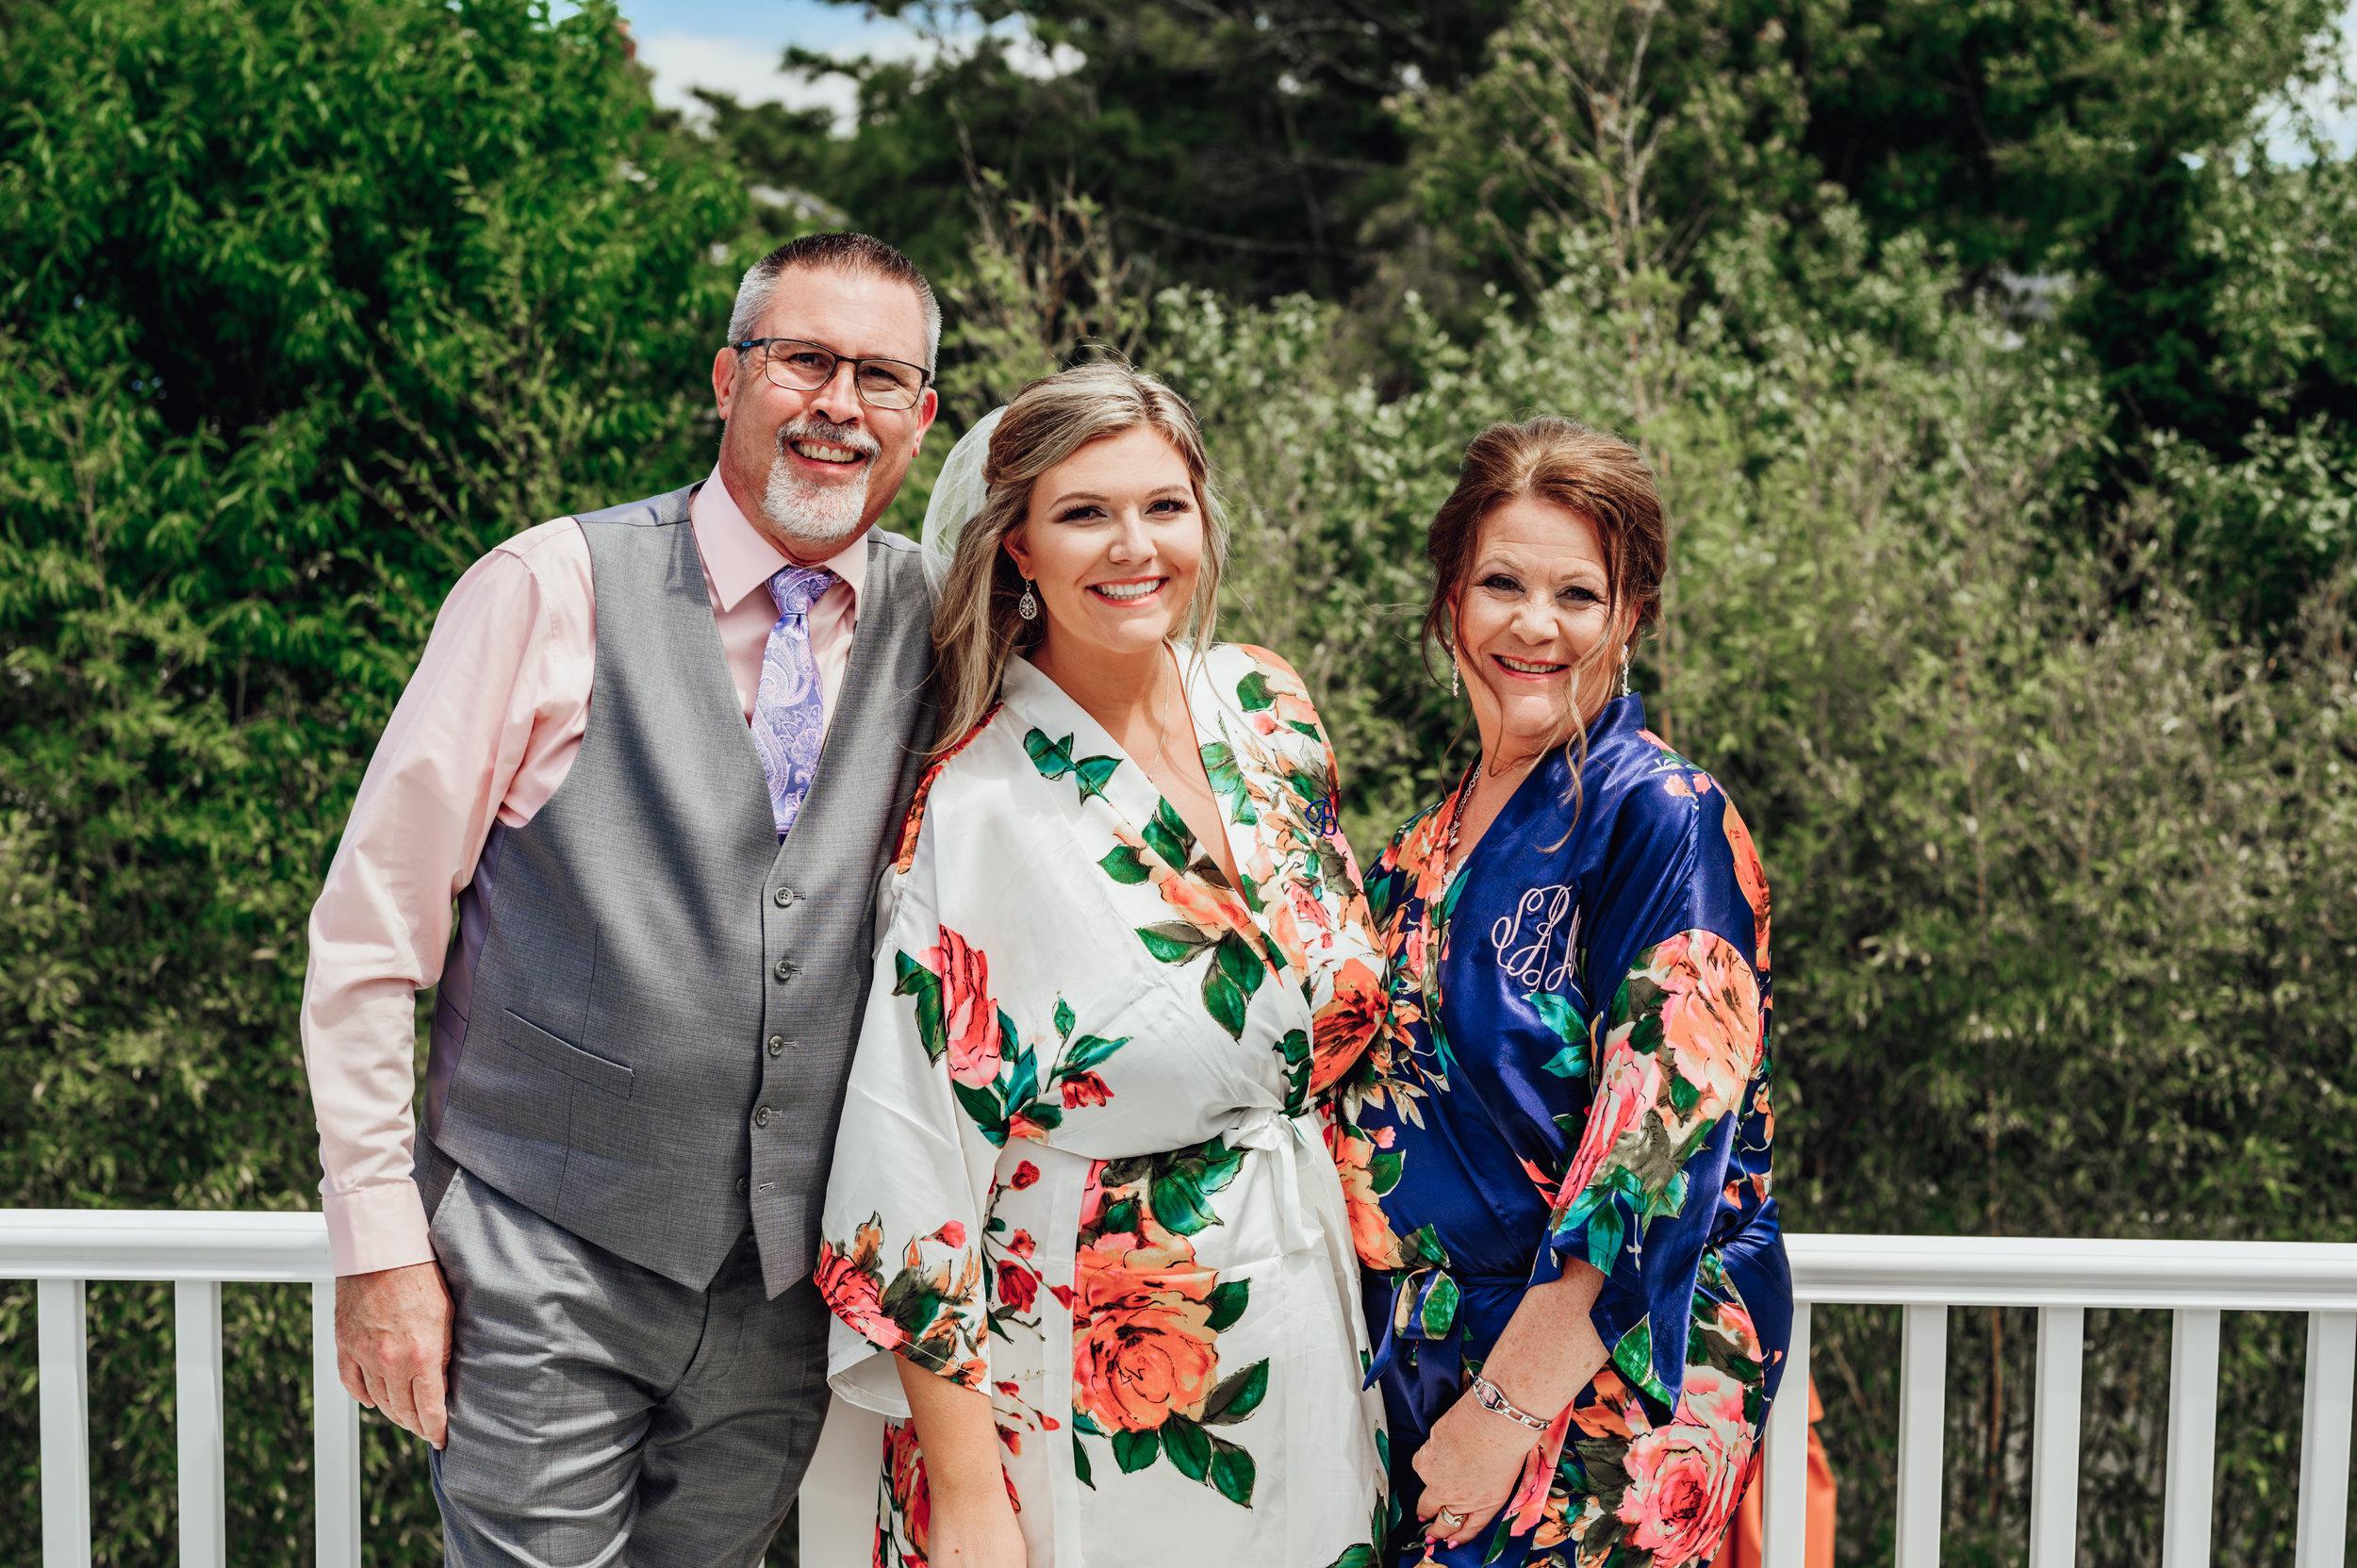 New Jersey Wedding Photographer, Felsberg Photography LBI wedding photography 25.jpg